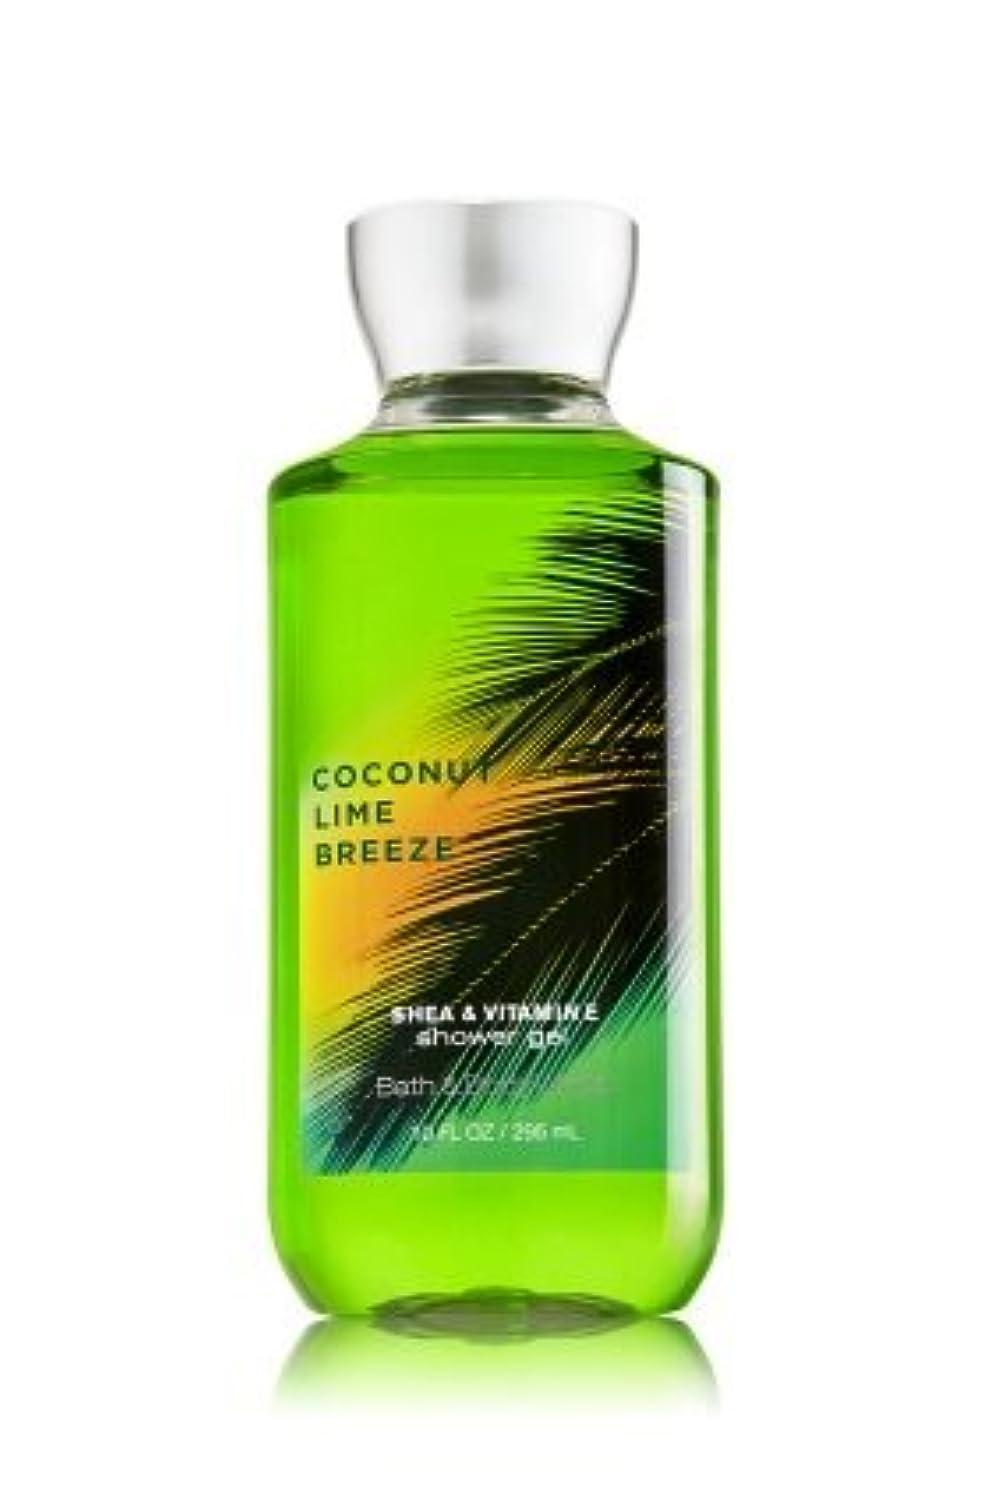 【Bath&Body Works/バス&ボディワークス】 シャワージェル ココナッツライムブリーズ Shower Gel Coconut Lime Breeze 10 fl oz / 295 mL [並行輸入品]